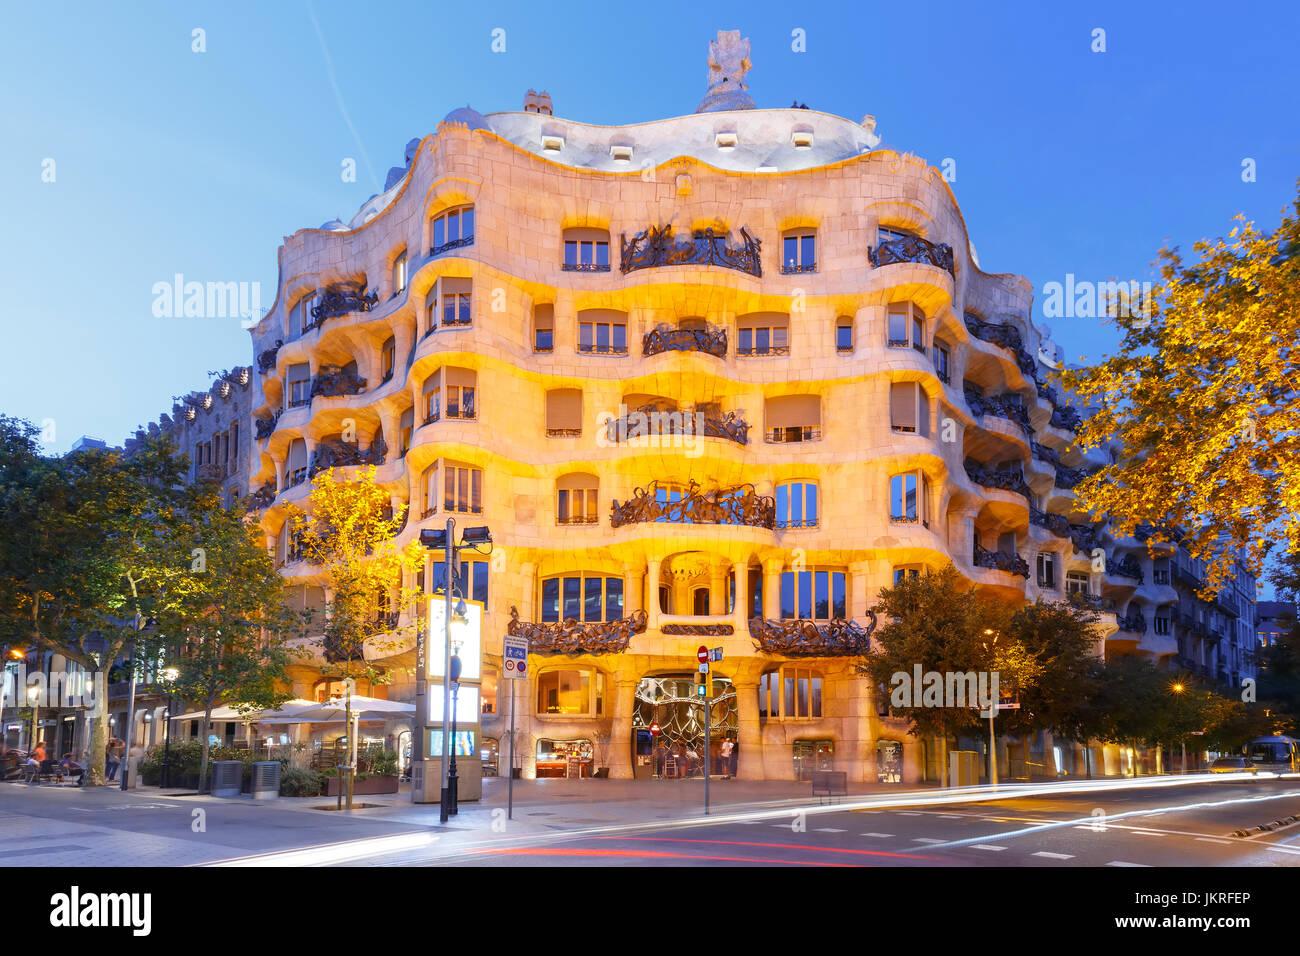 Casa Mila at night, Barcelona, Spain - Stock Image